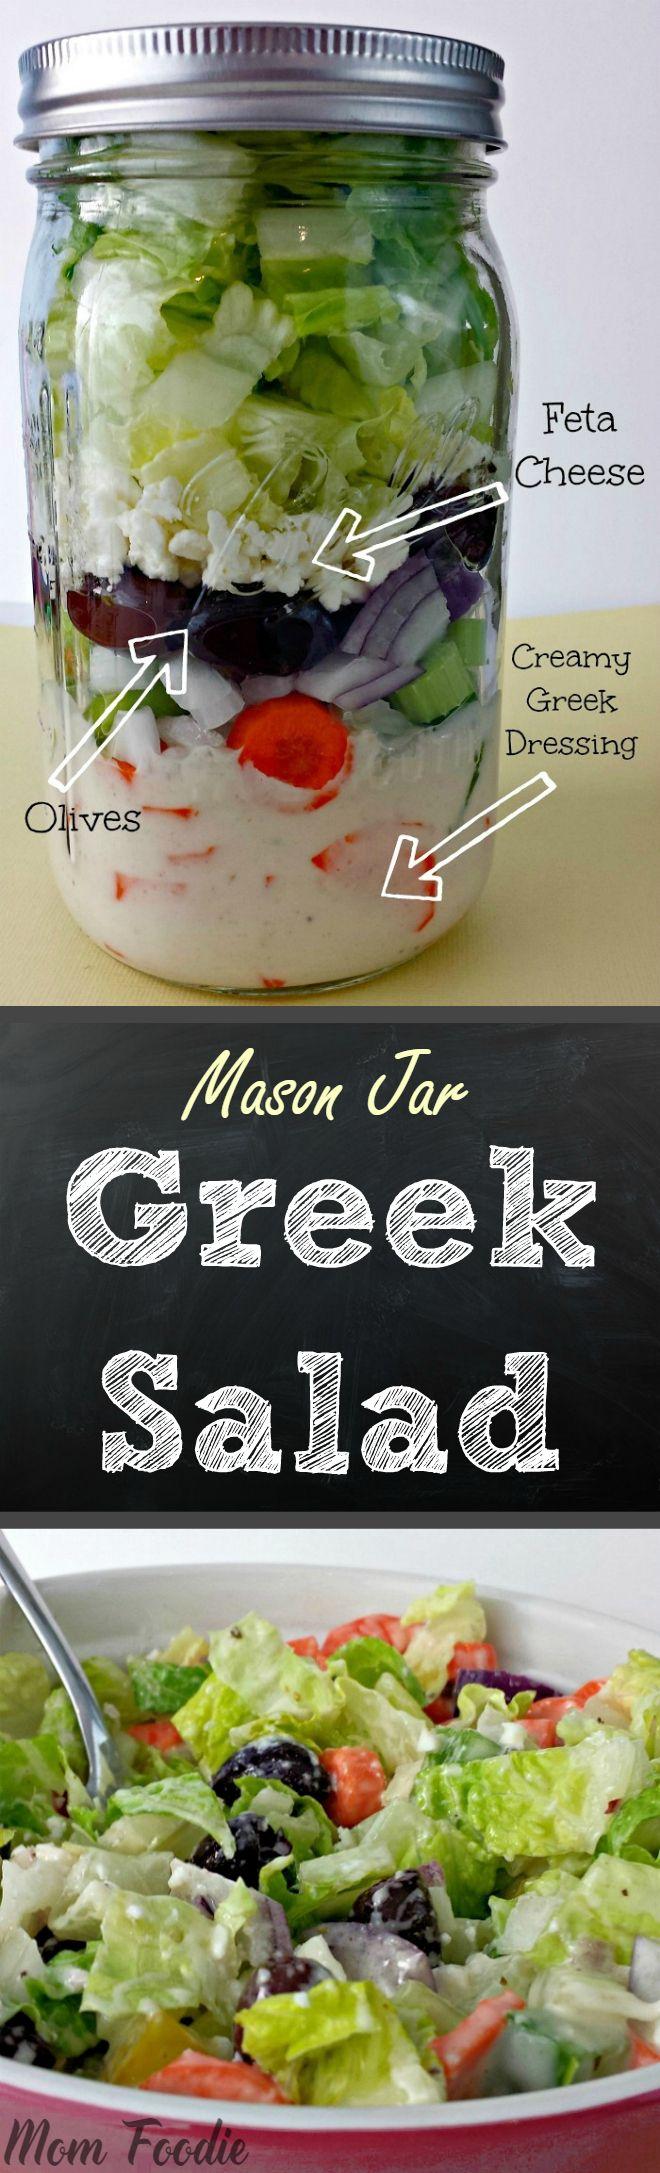 Mason Jar Greek Salad